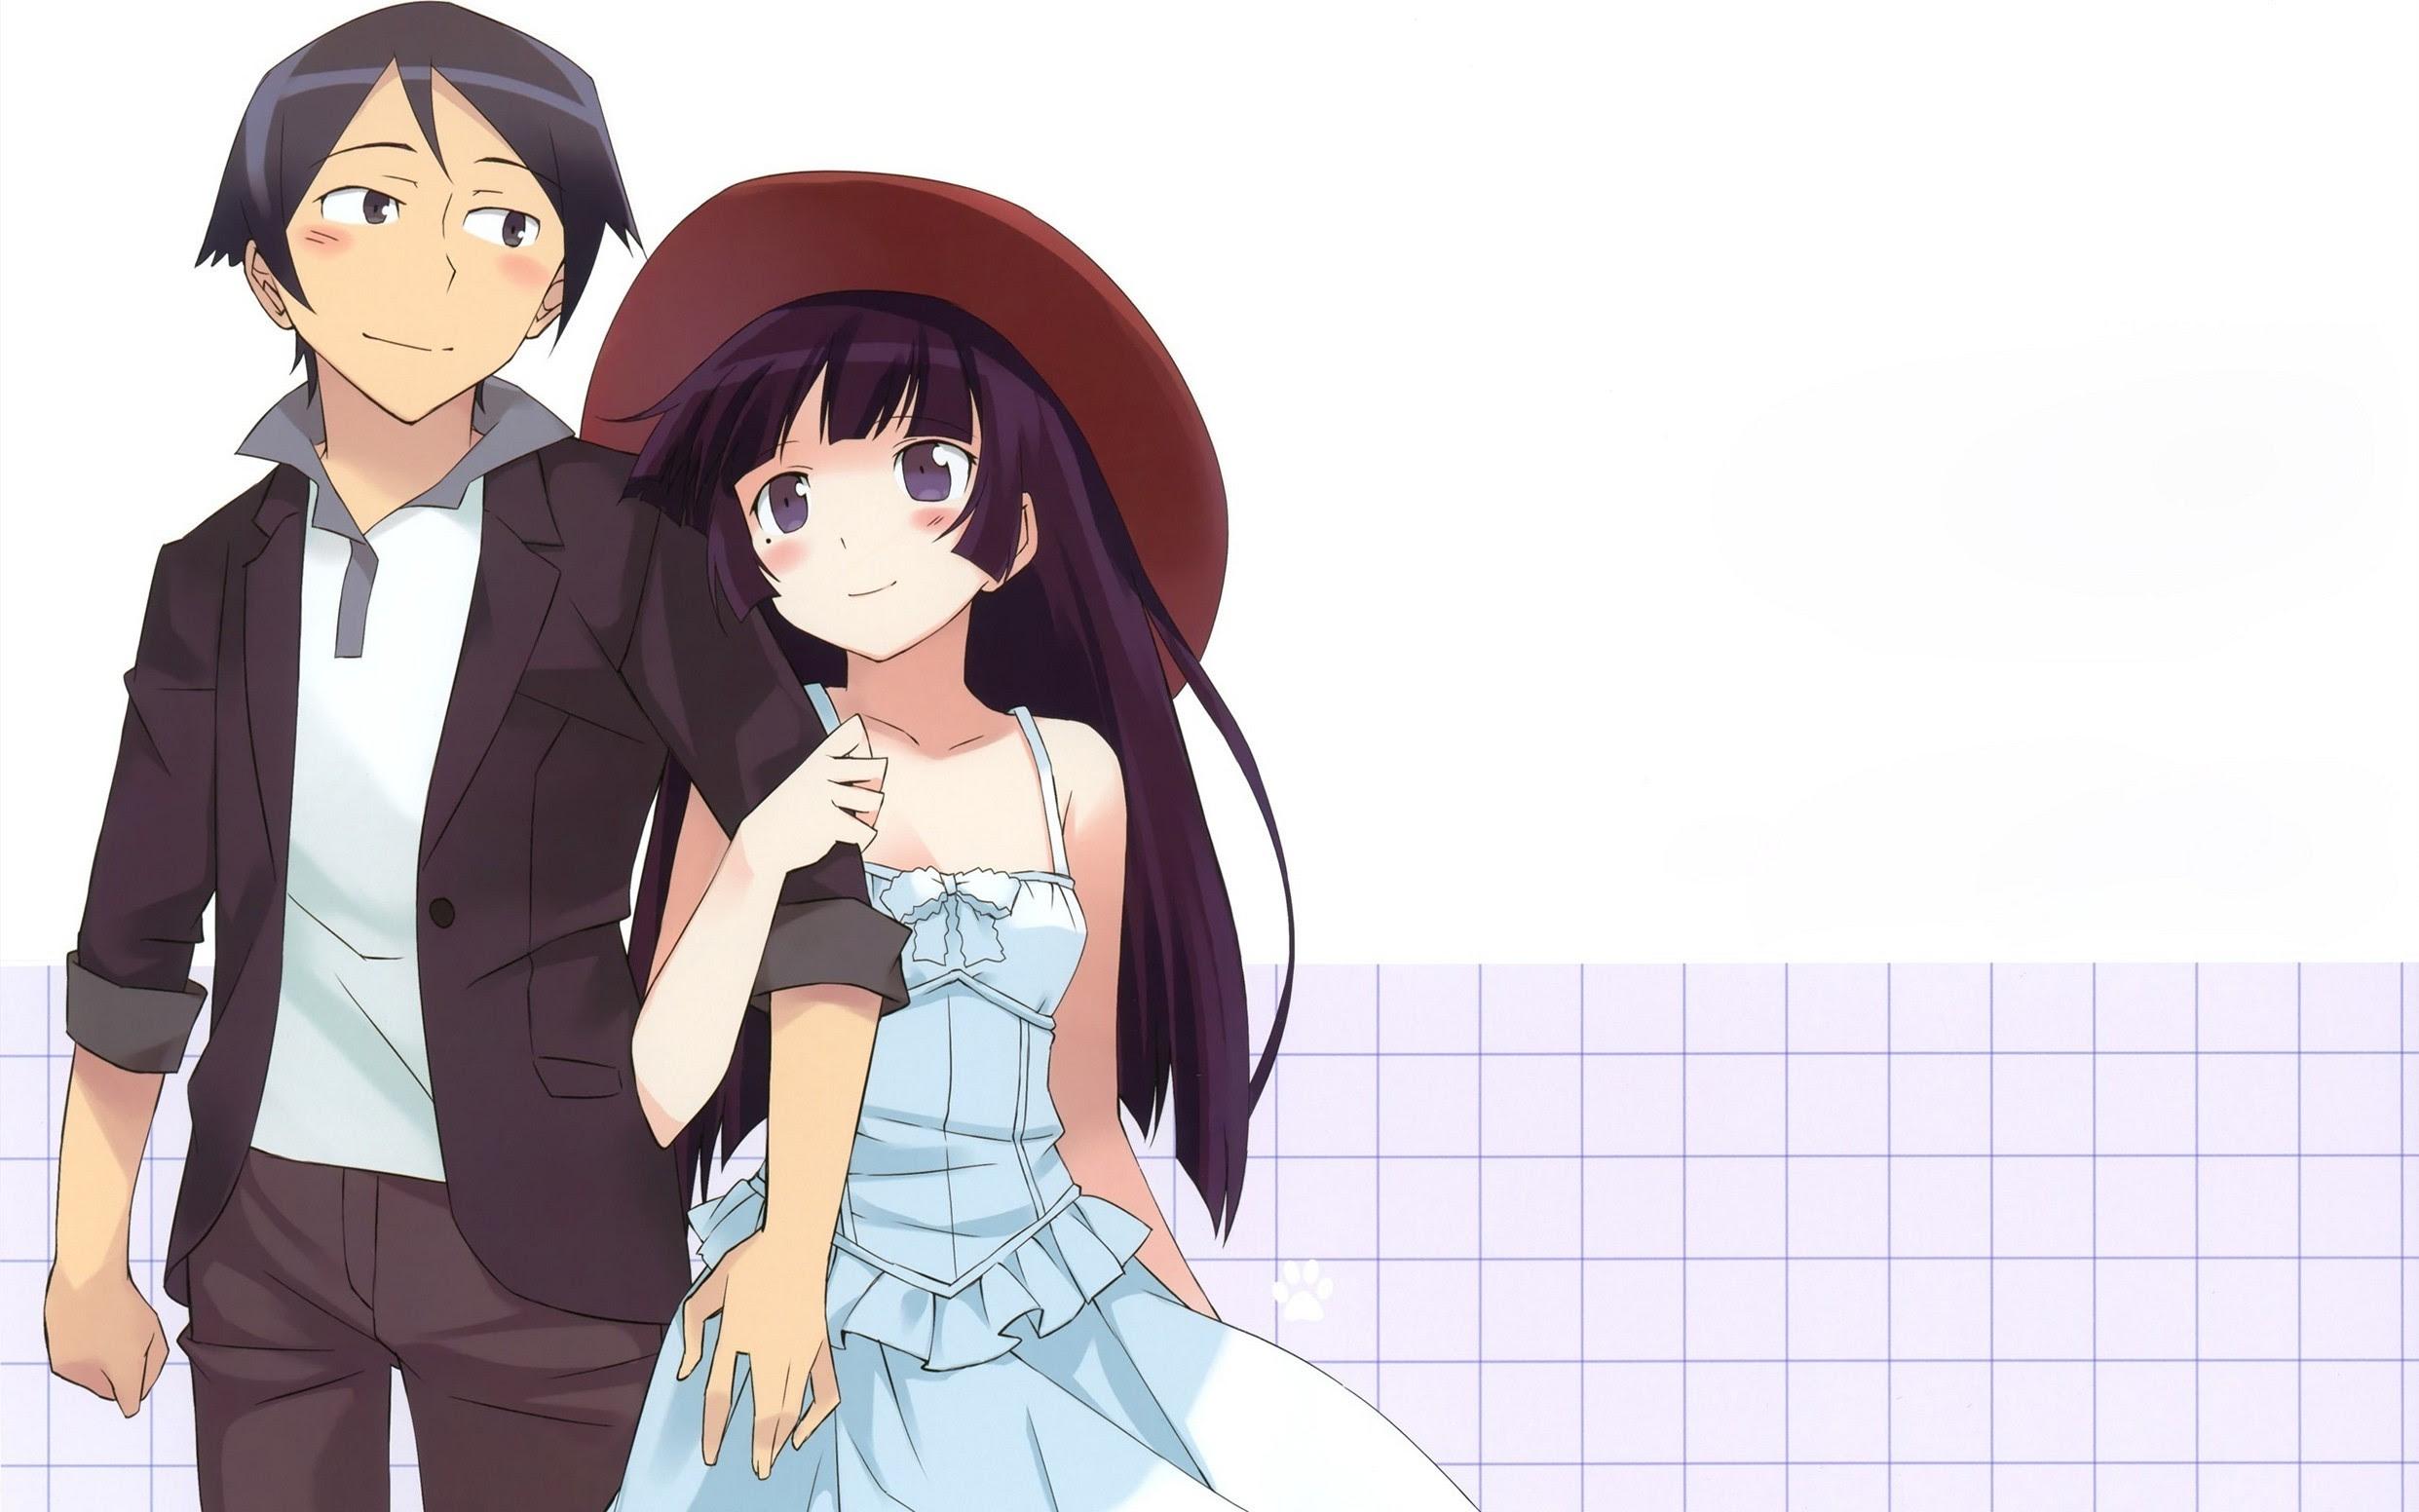 Sad Anime Wallpaper (64+ images)